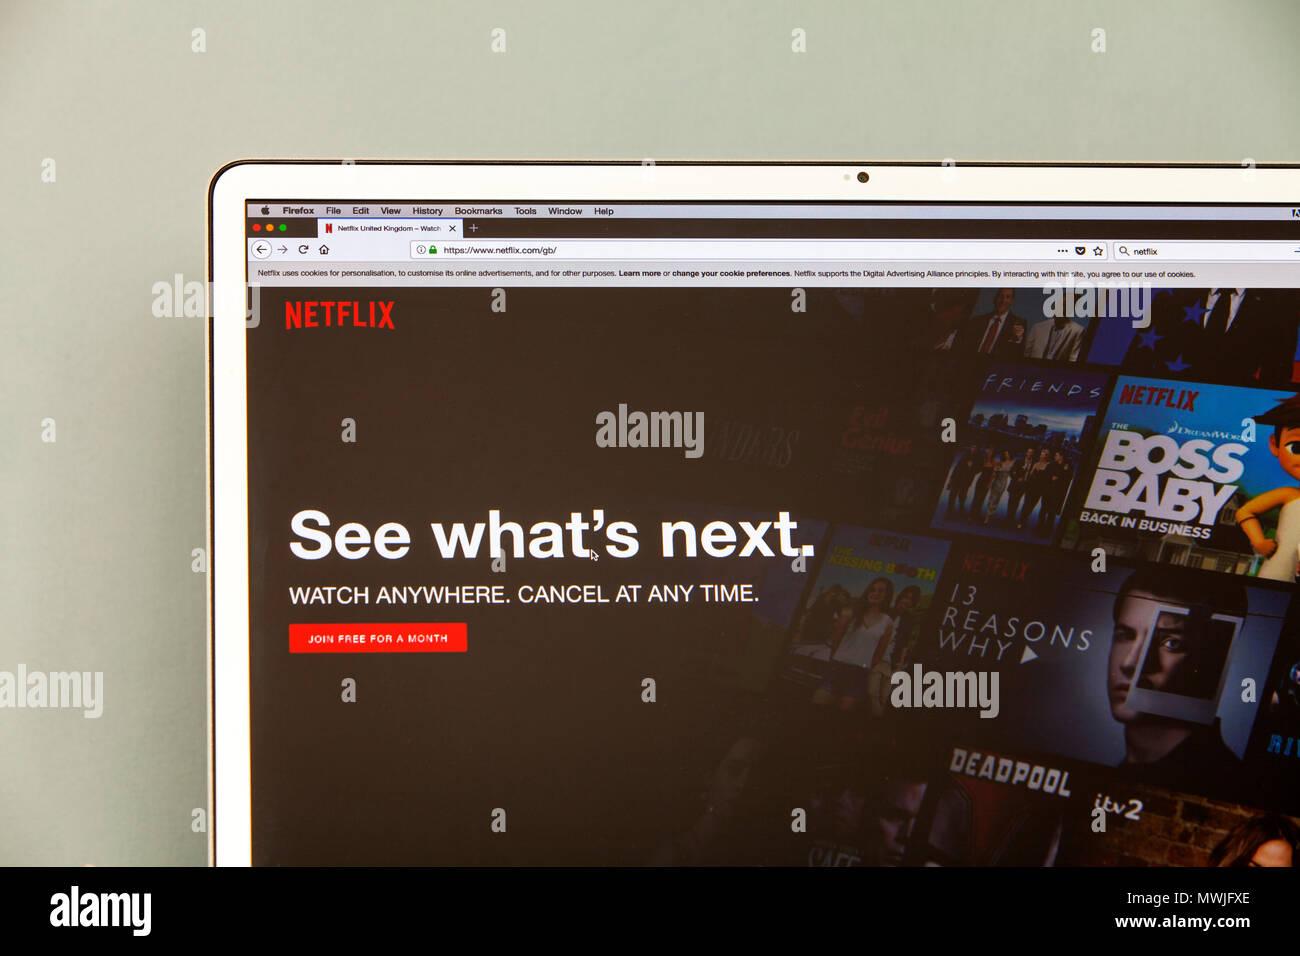 Netflix Homepage, Netflix.com, Netflix Streaming Service, Netflix Filme, Netflix, Netflix logo, Netflix Filme und Shows online, Netflix online Stockbild